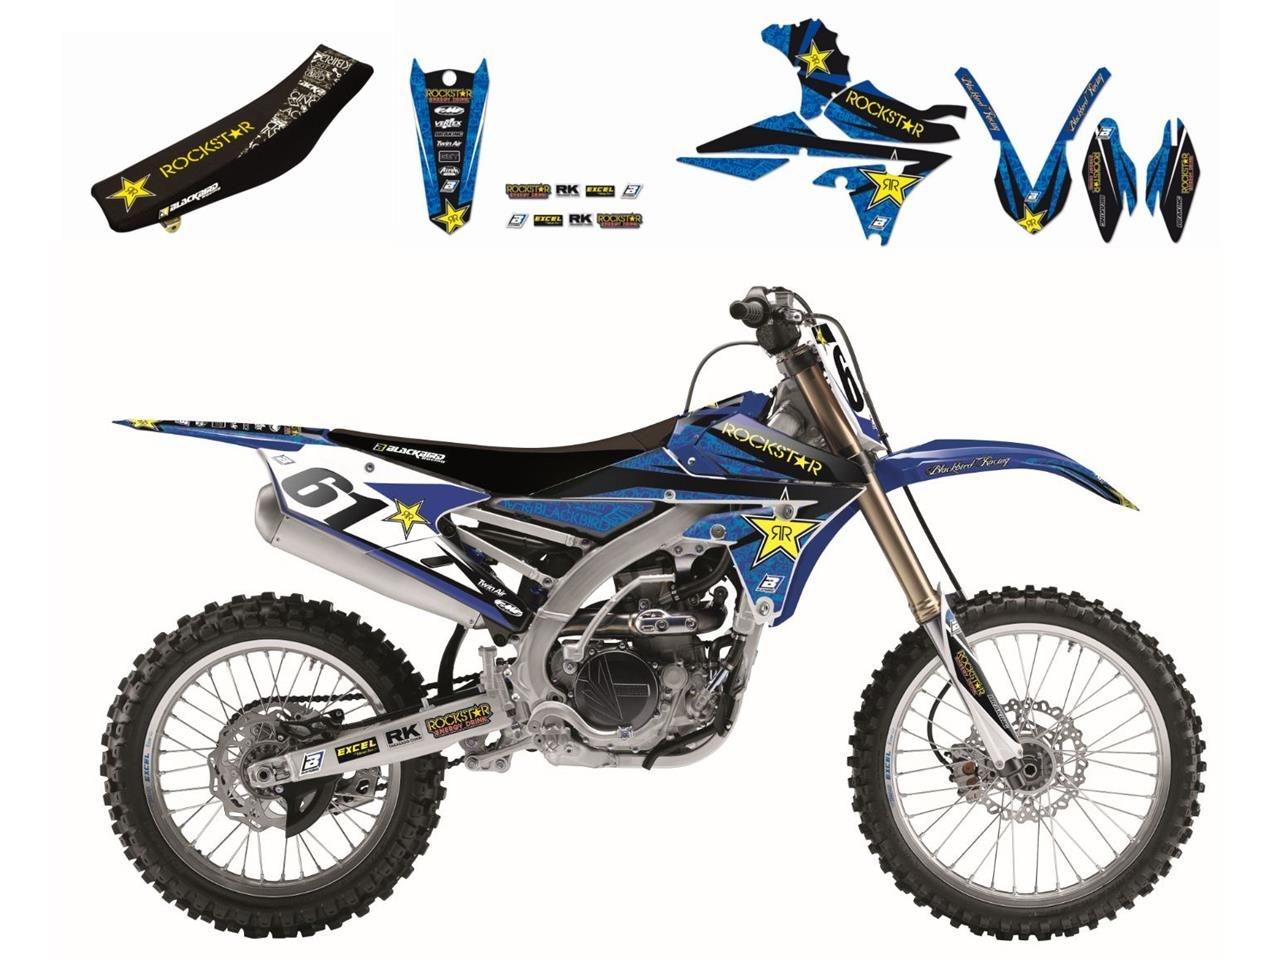 Kit déco + Housse de selle BlackBird Factory Rockstar Energy Yamaha 25